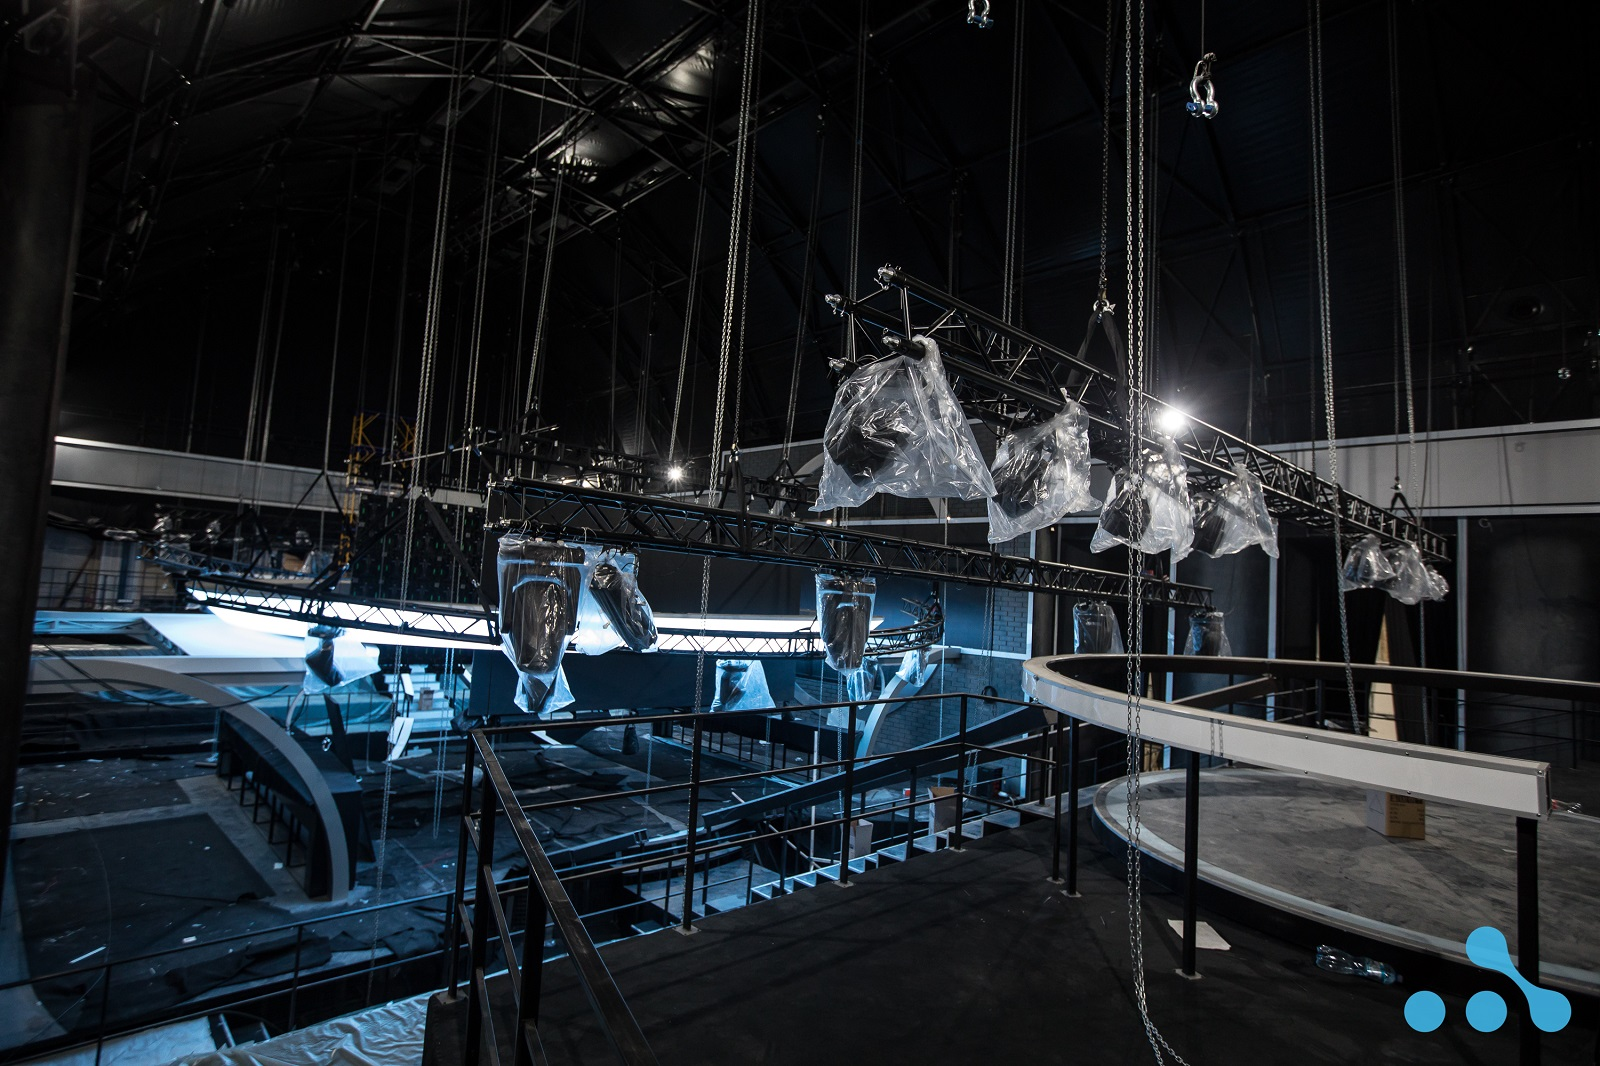 WePlay Esports Arena Kyiv. Этапы строительства. Источник фото: WePlay Esports